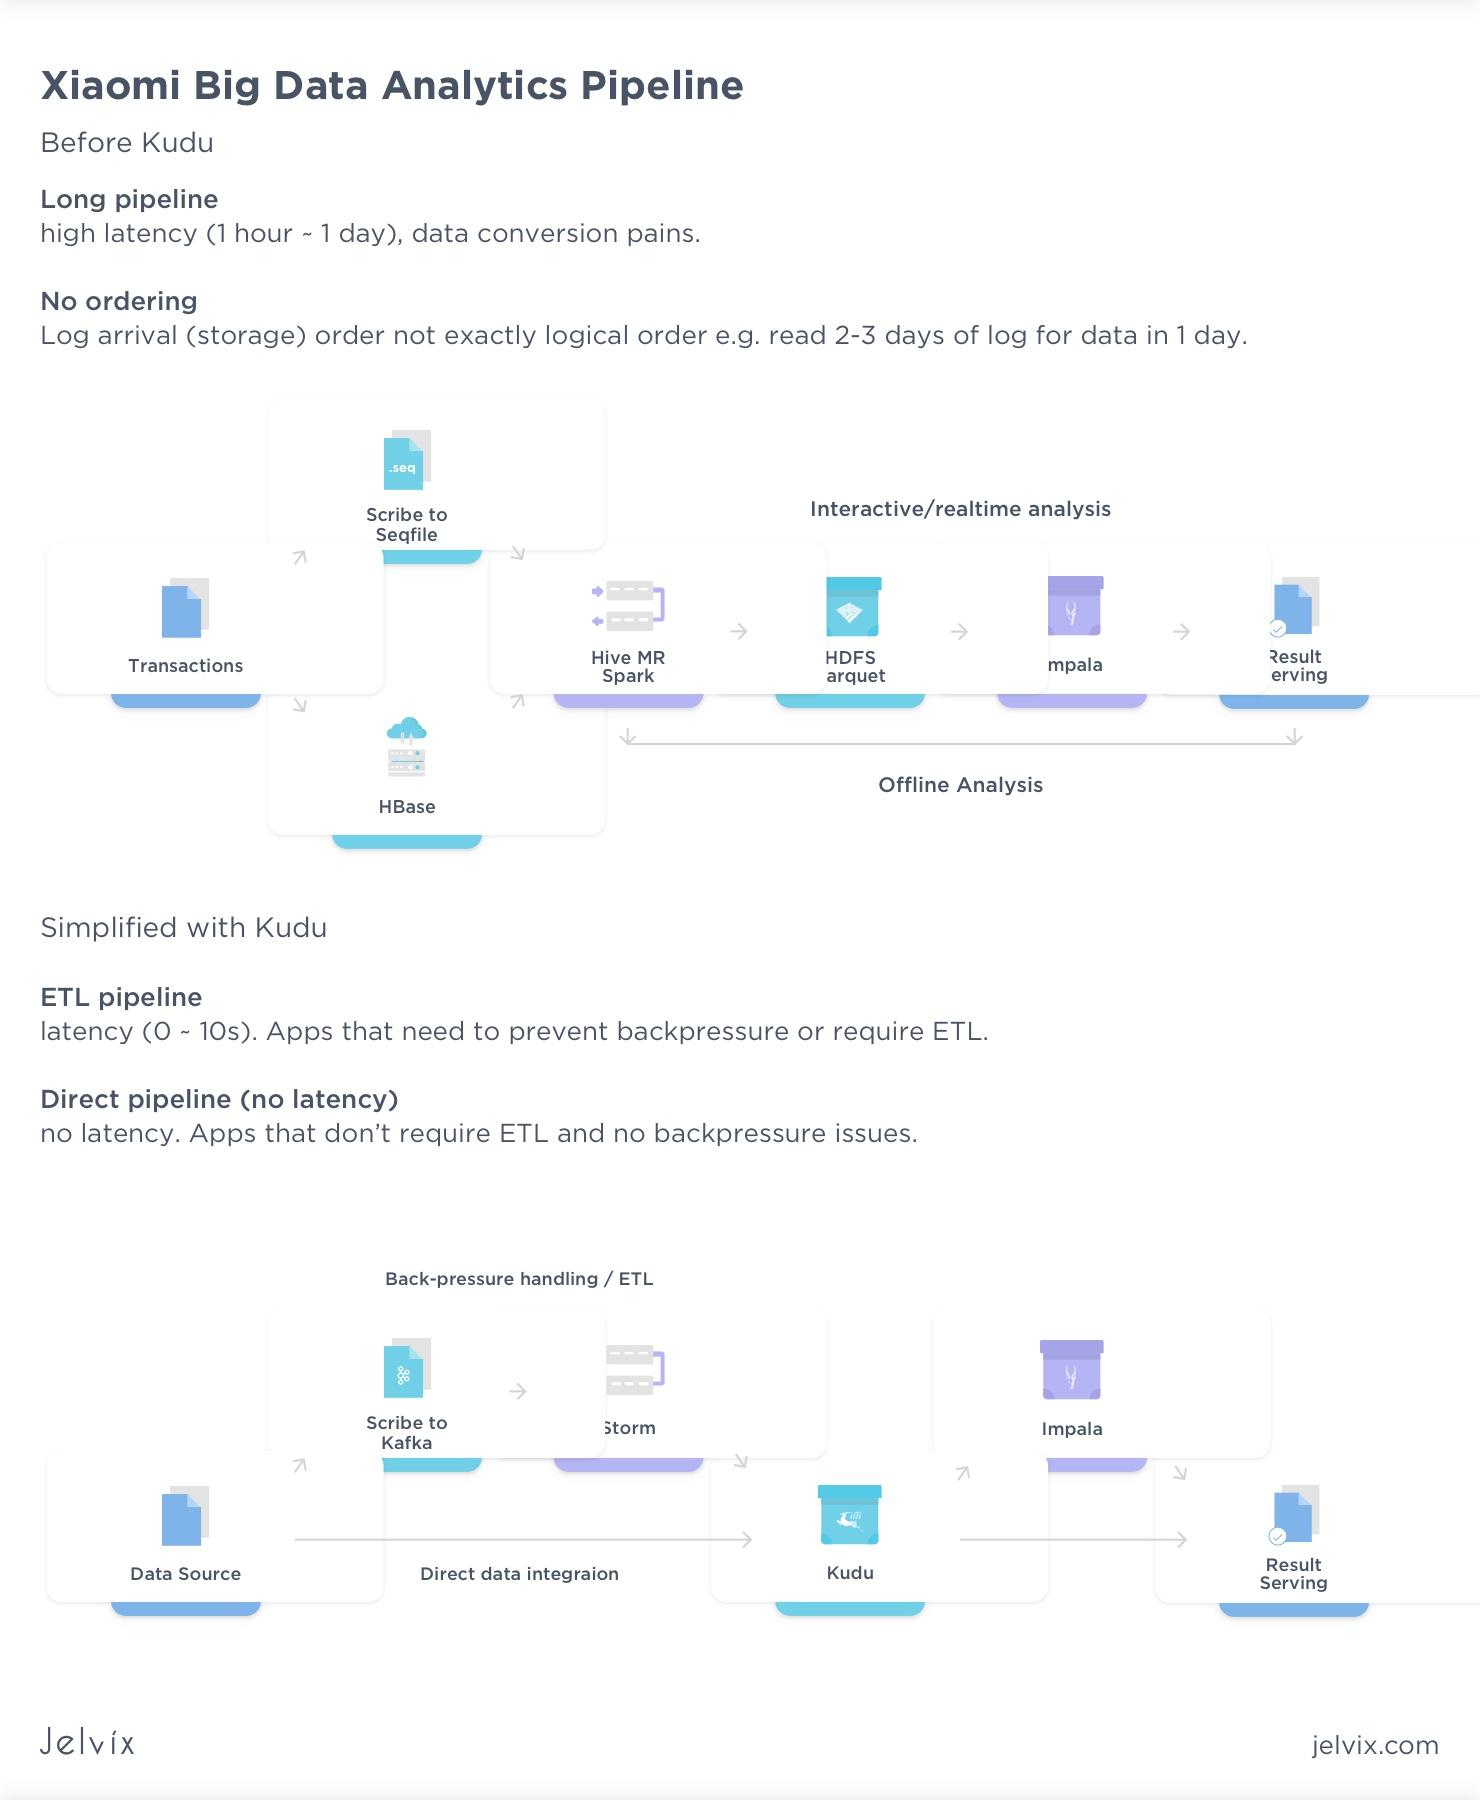 Xiaomi Big Data analytics pipeline